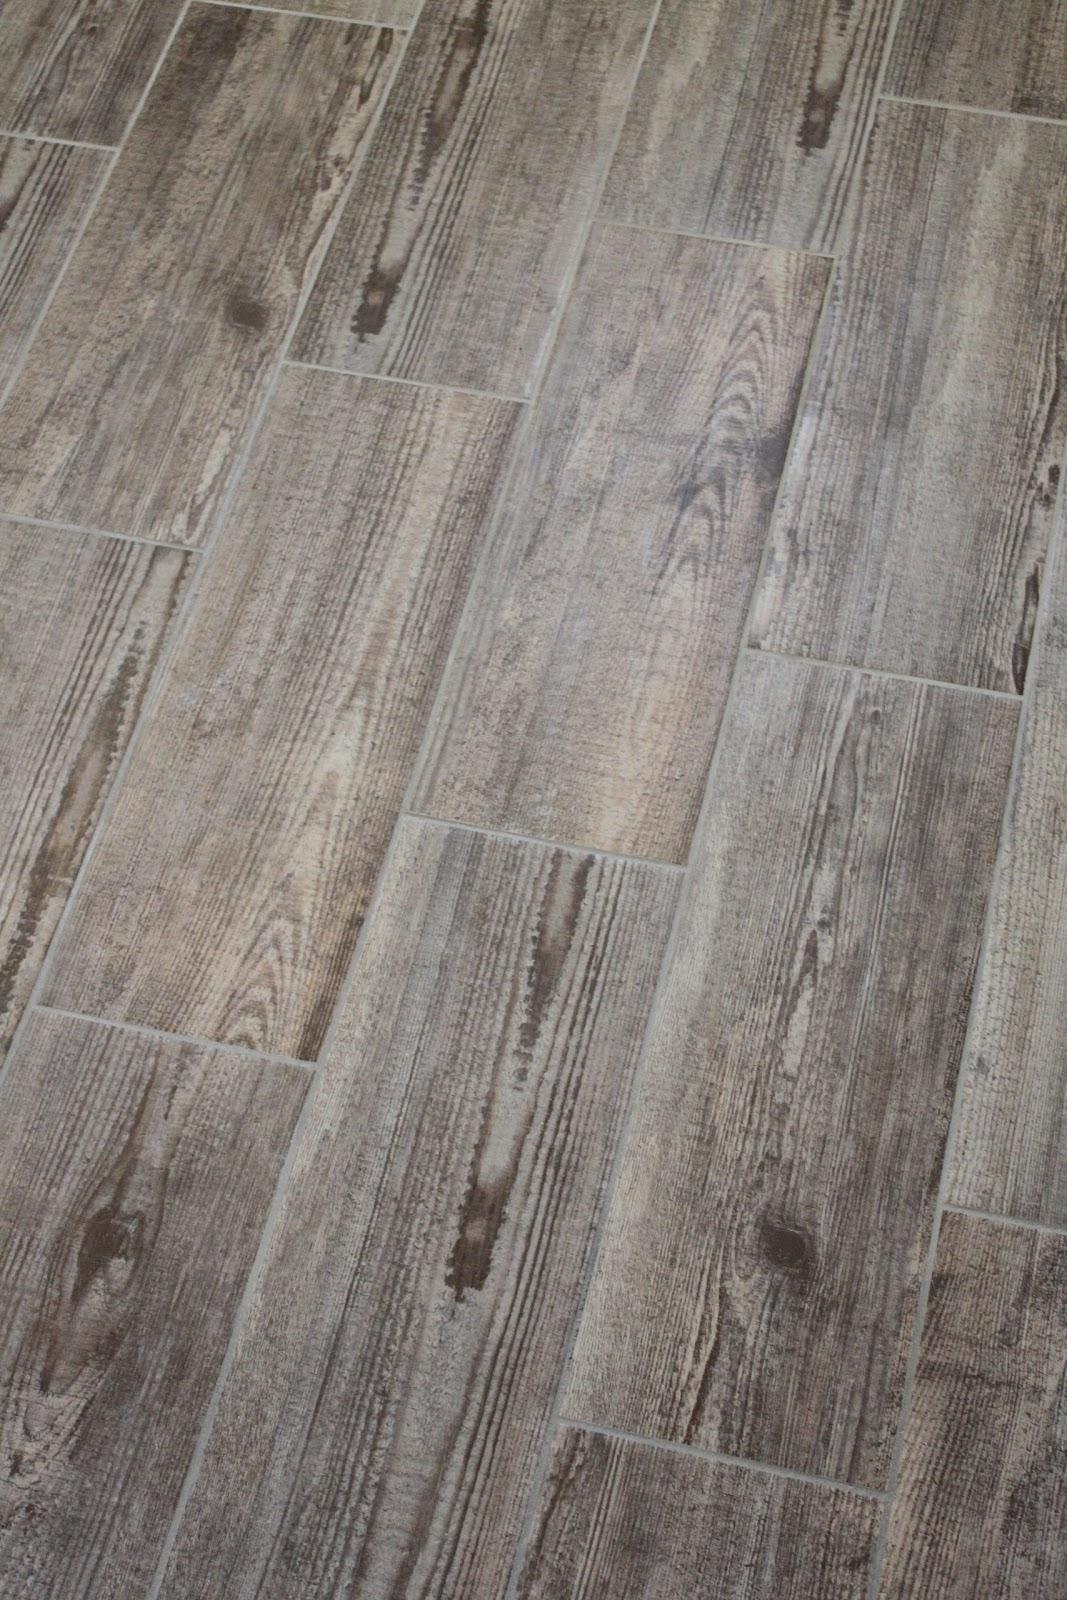 30 Beautiful Bathroom Tiles That Look Like Wood   eyagci.com